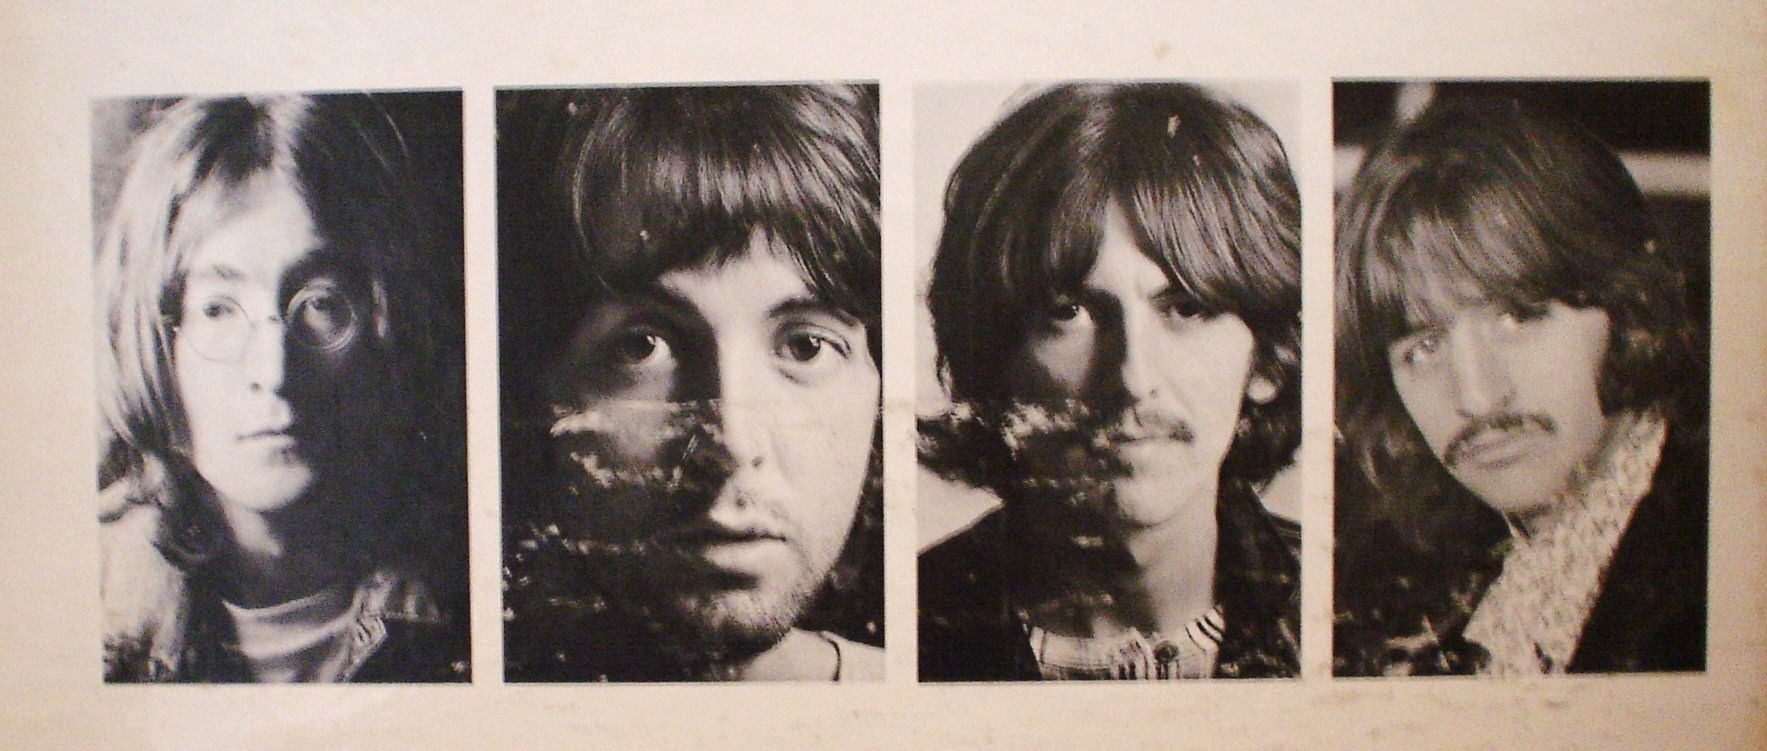 The Beatles the white album - the-white-album-the-beatles-2488755-1767-751